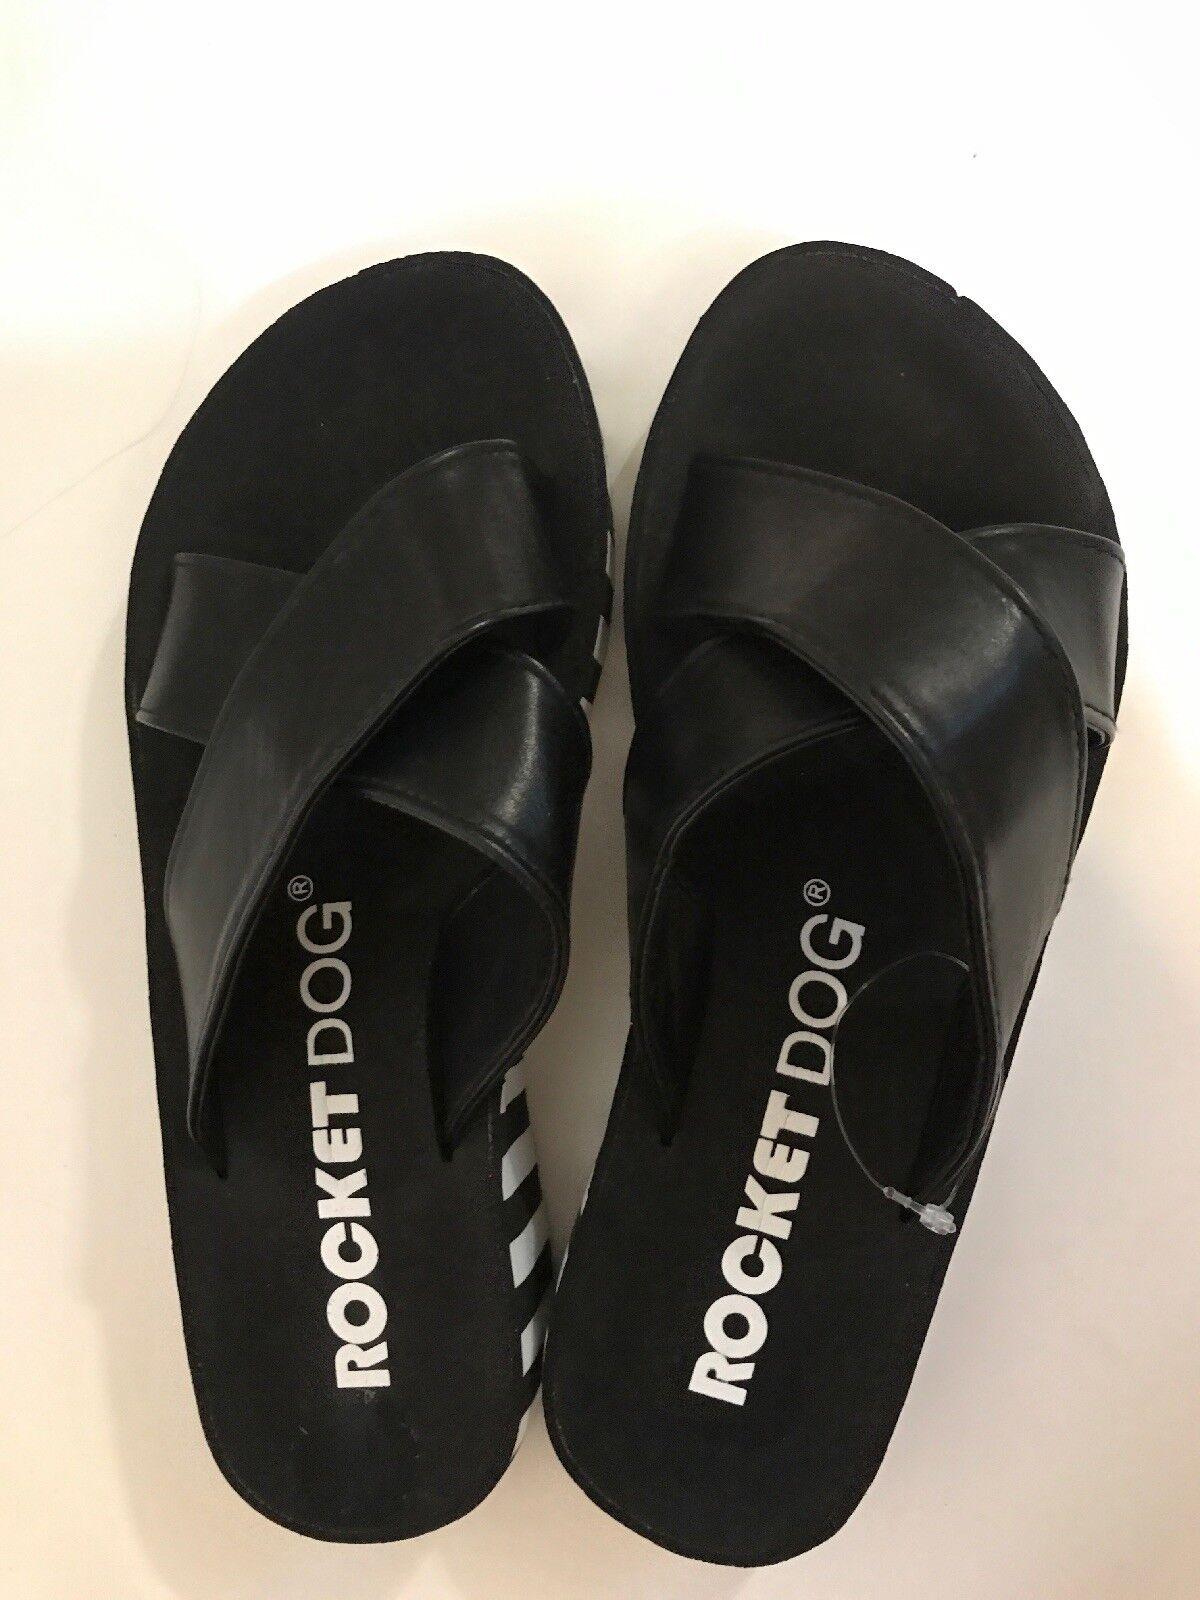 NEW Sandals ROCKET DOG Slip On Sandals NEW Shoes Black sz 7 4ca72d